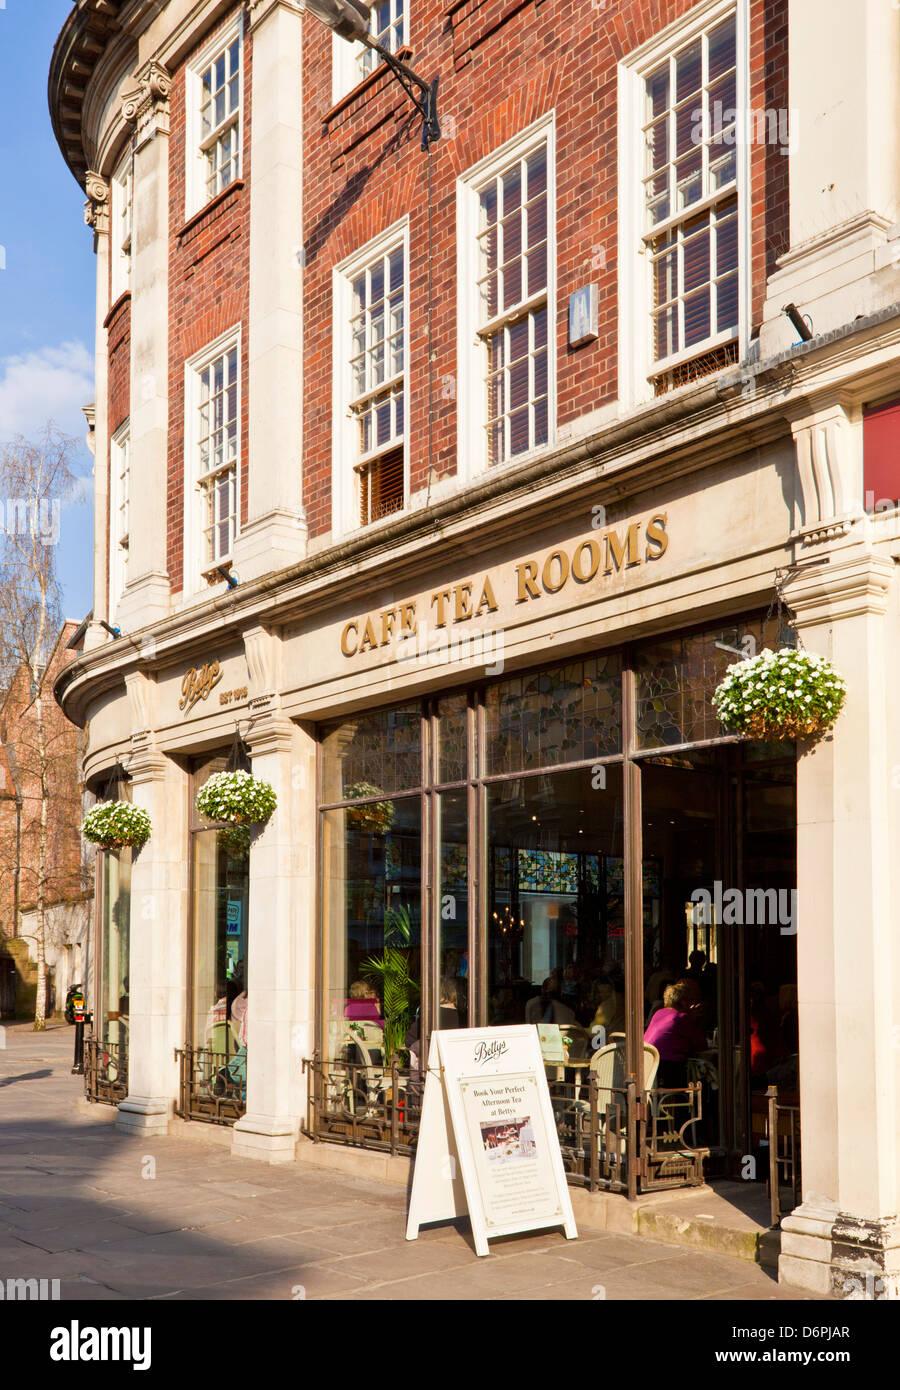 Betty's tea room St Helens Square City centre York North Yorkshire England UK GB EU Europe - Stock Image